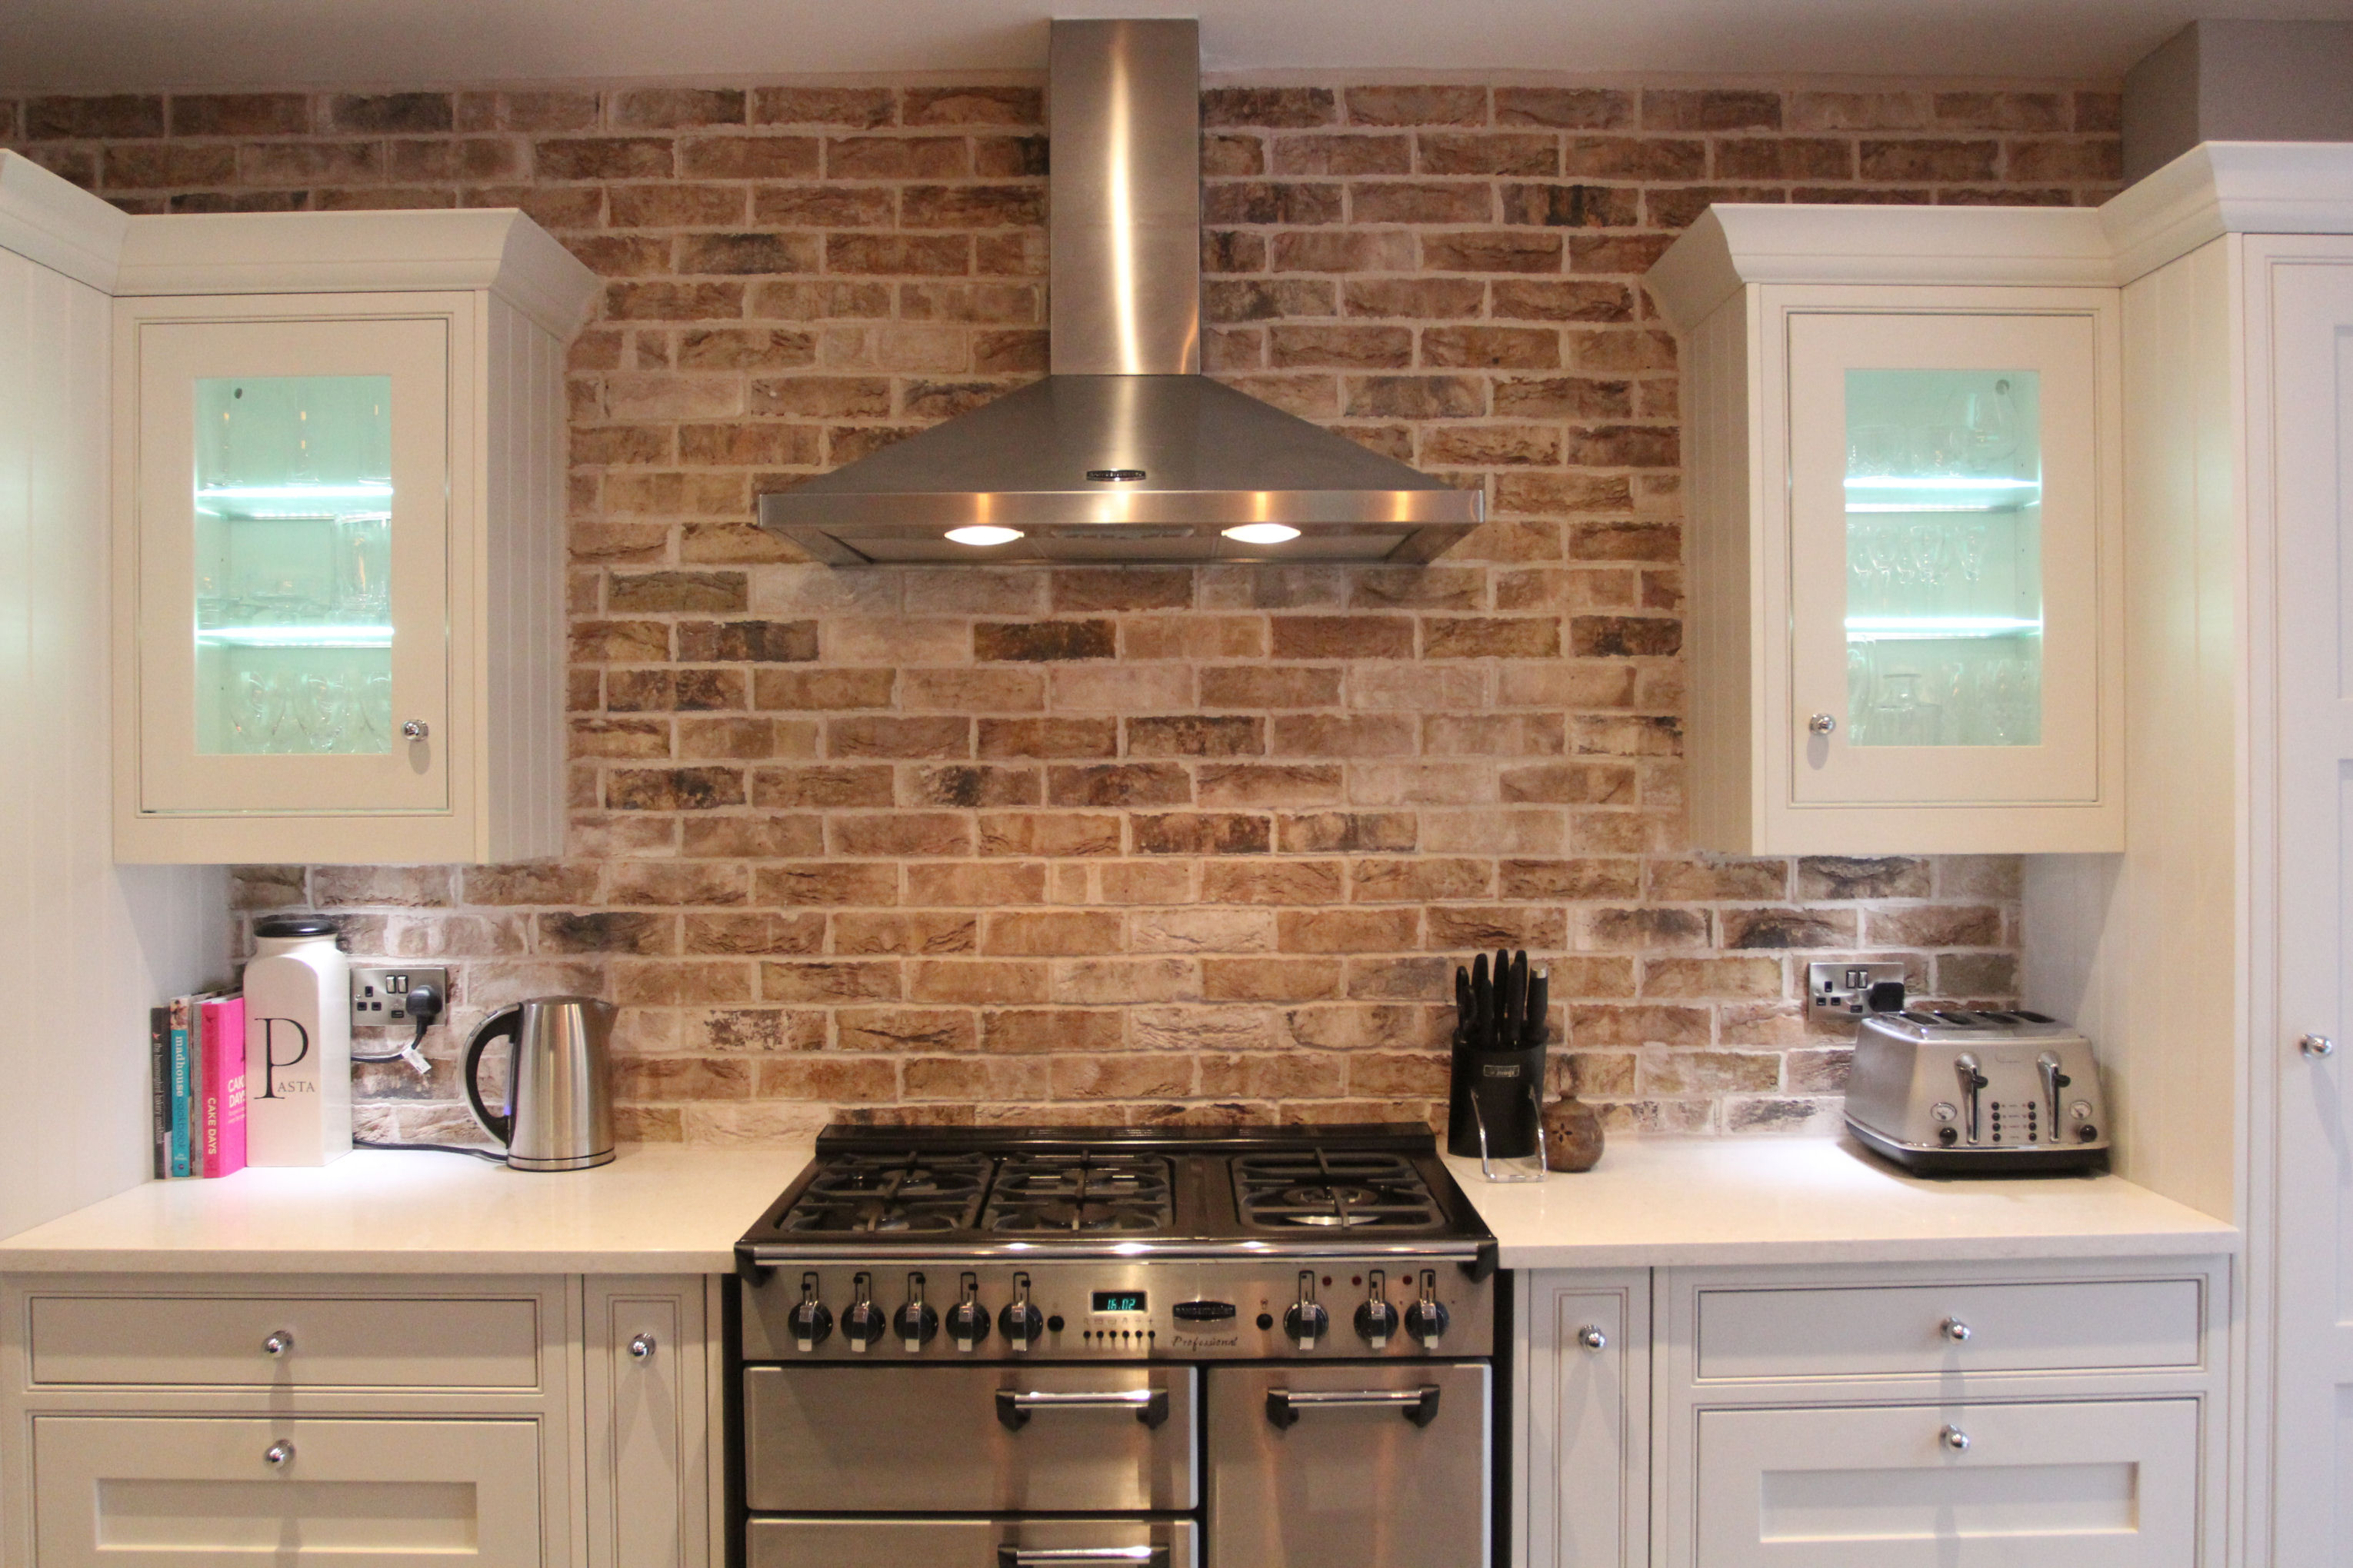 White Cabinets Black Countertops Brick Backsplash